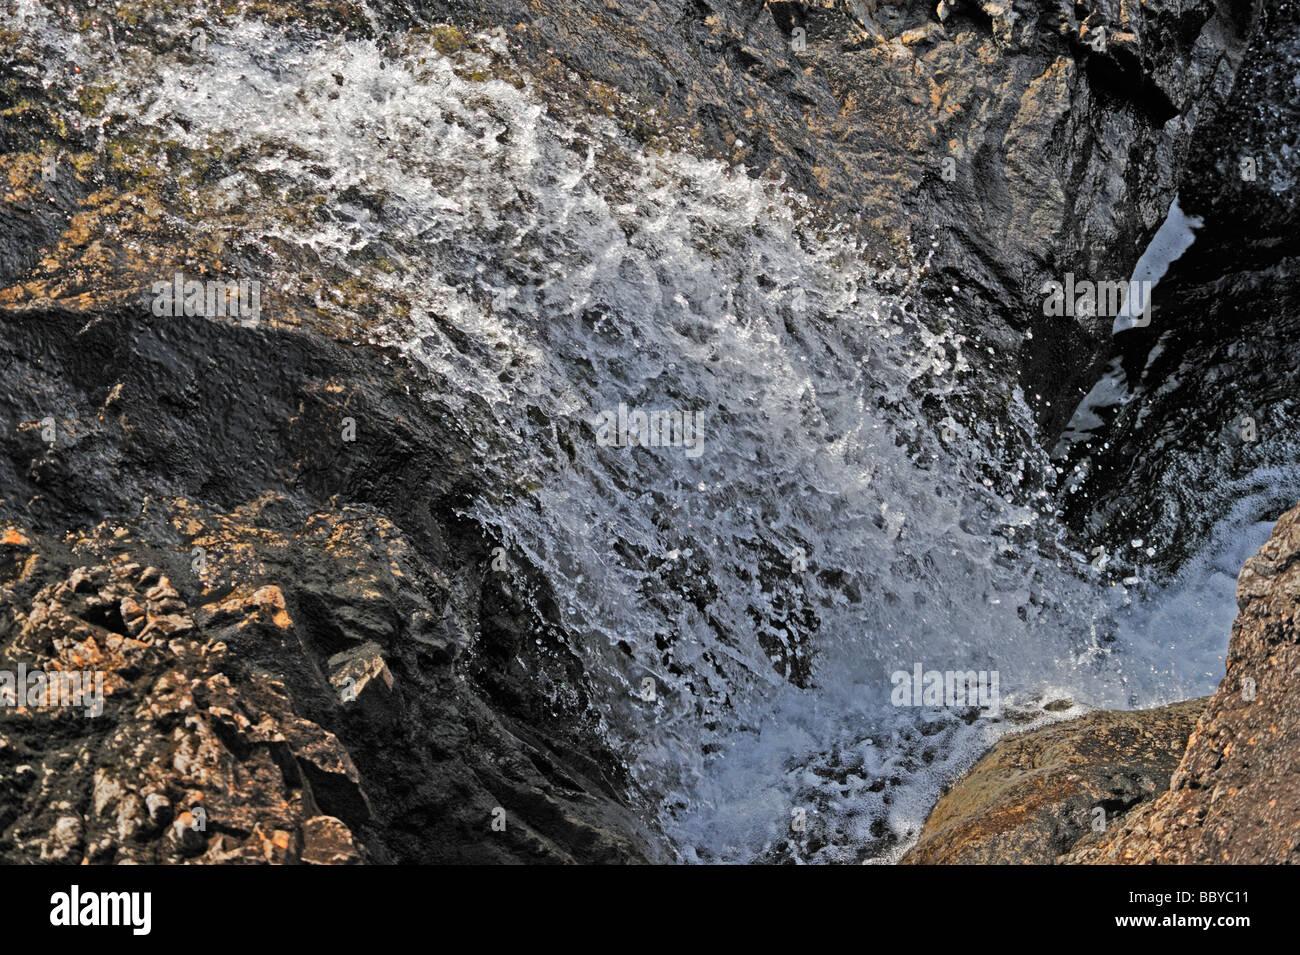 Rock formations. The Fairy Pools, Allt Coir' a' Mhadaidh, Coire na Creich, Glen Brittle, Minginish, Isle of Skye, Scotland, U.K. Stock Photo